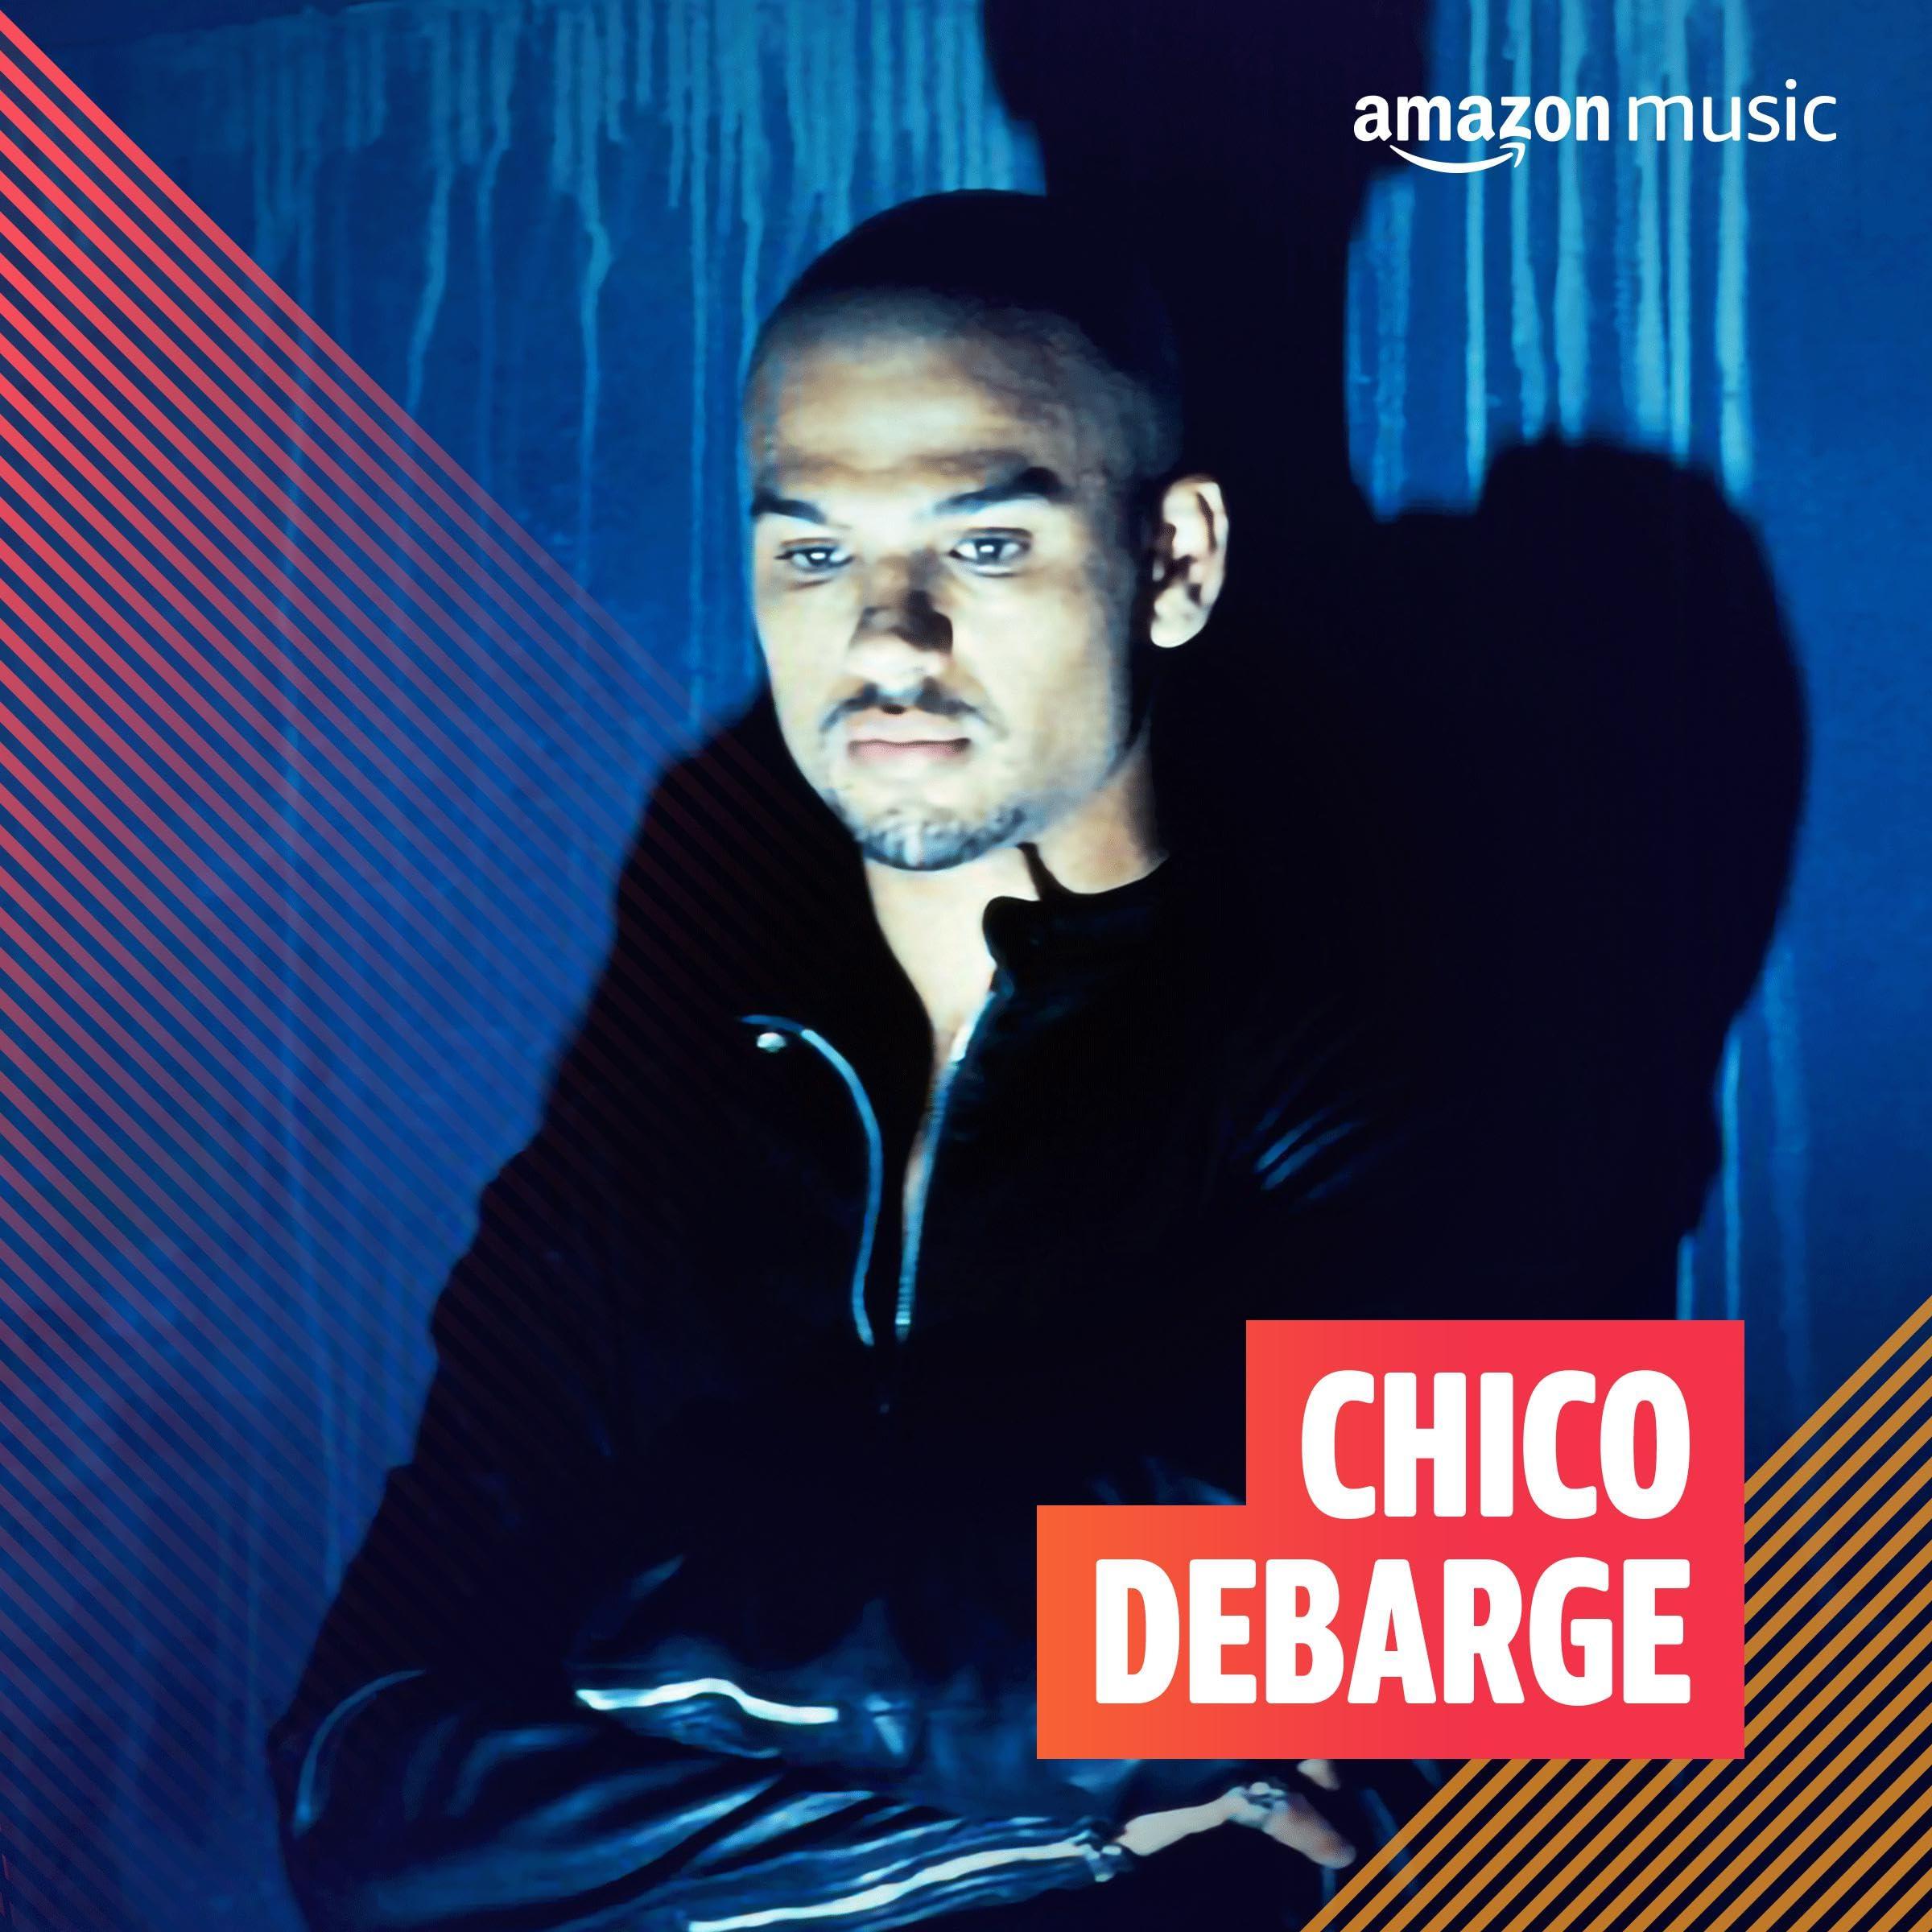 Chico DeBarge